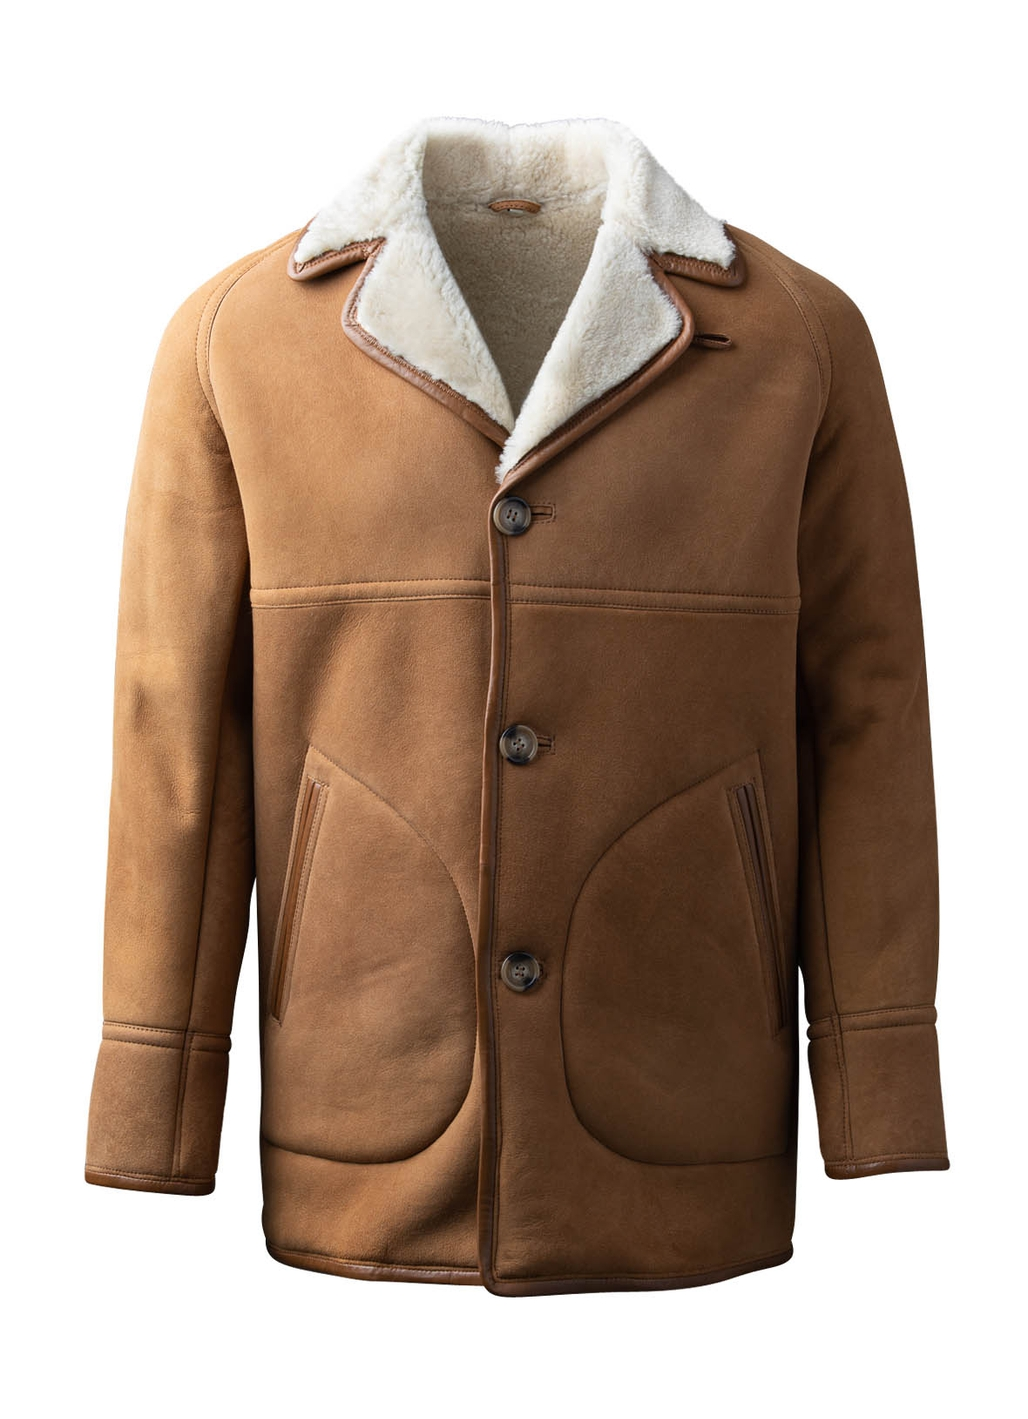 Dock Mid-Length Sheepskin Coat in Tan